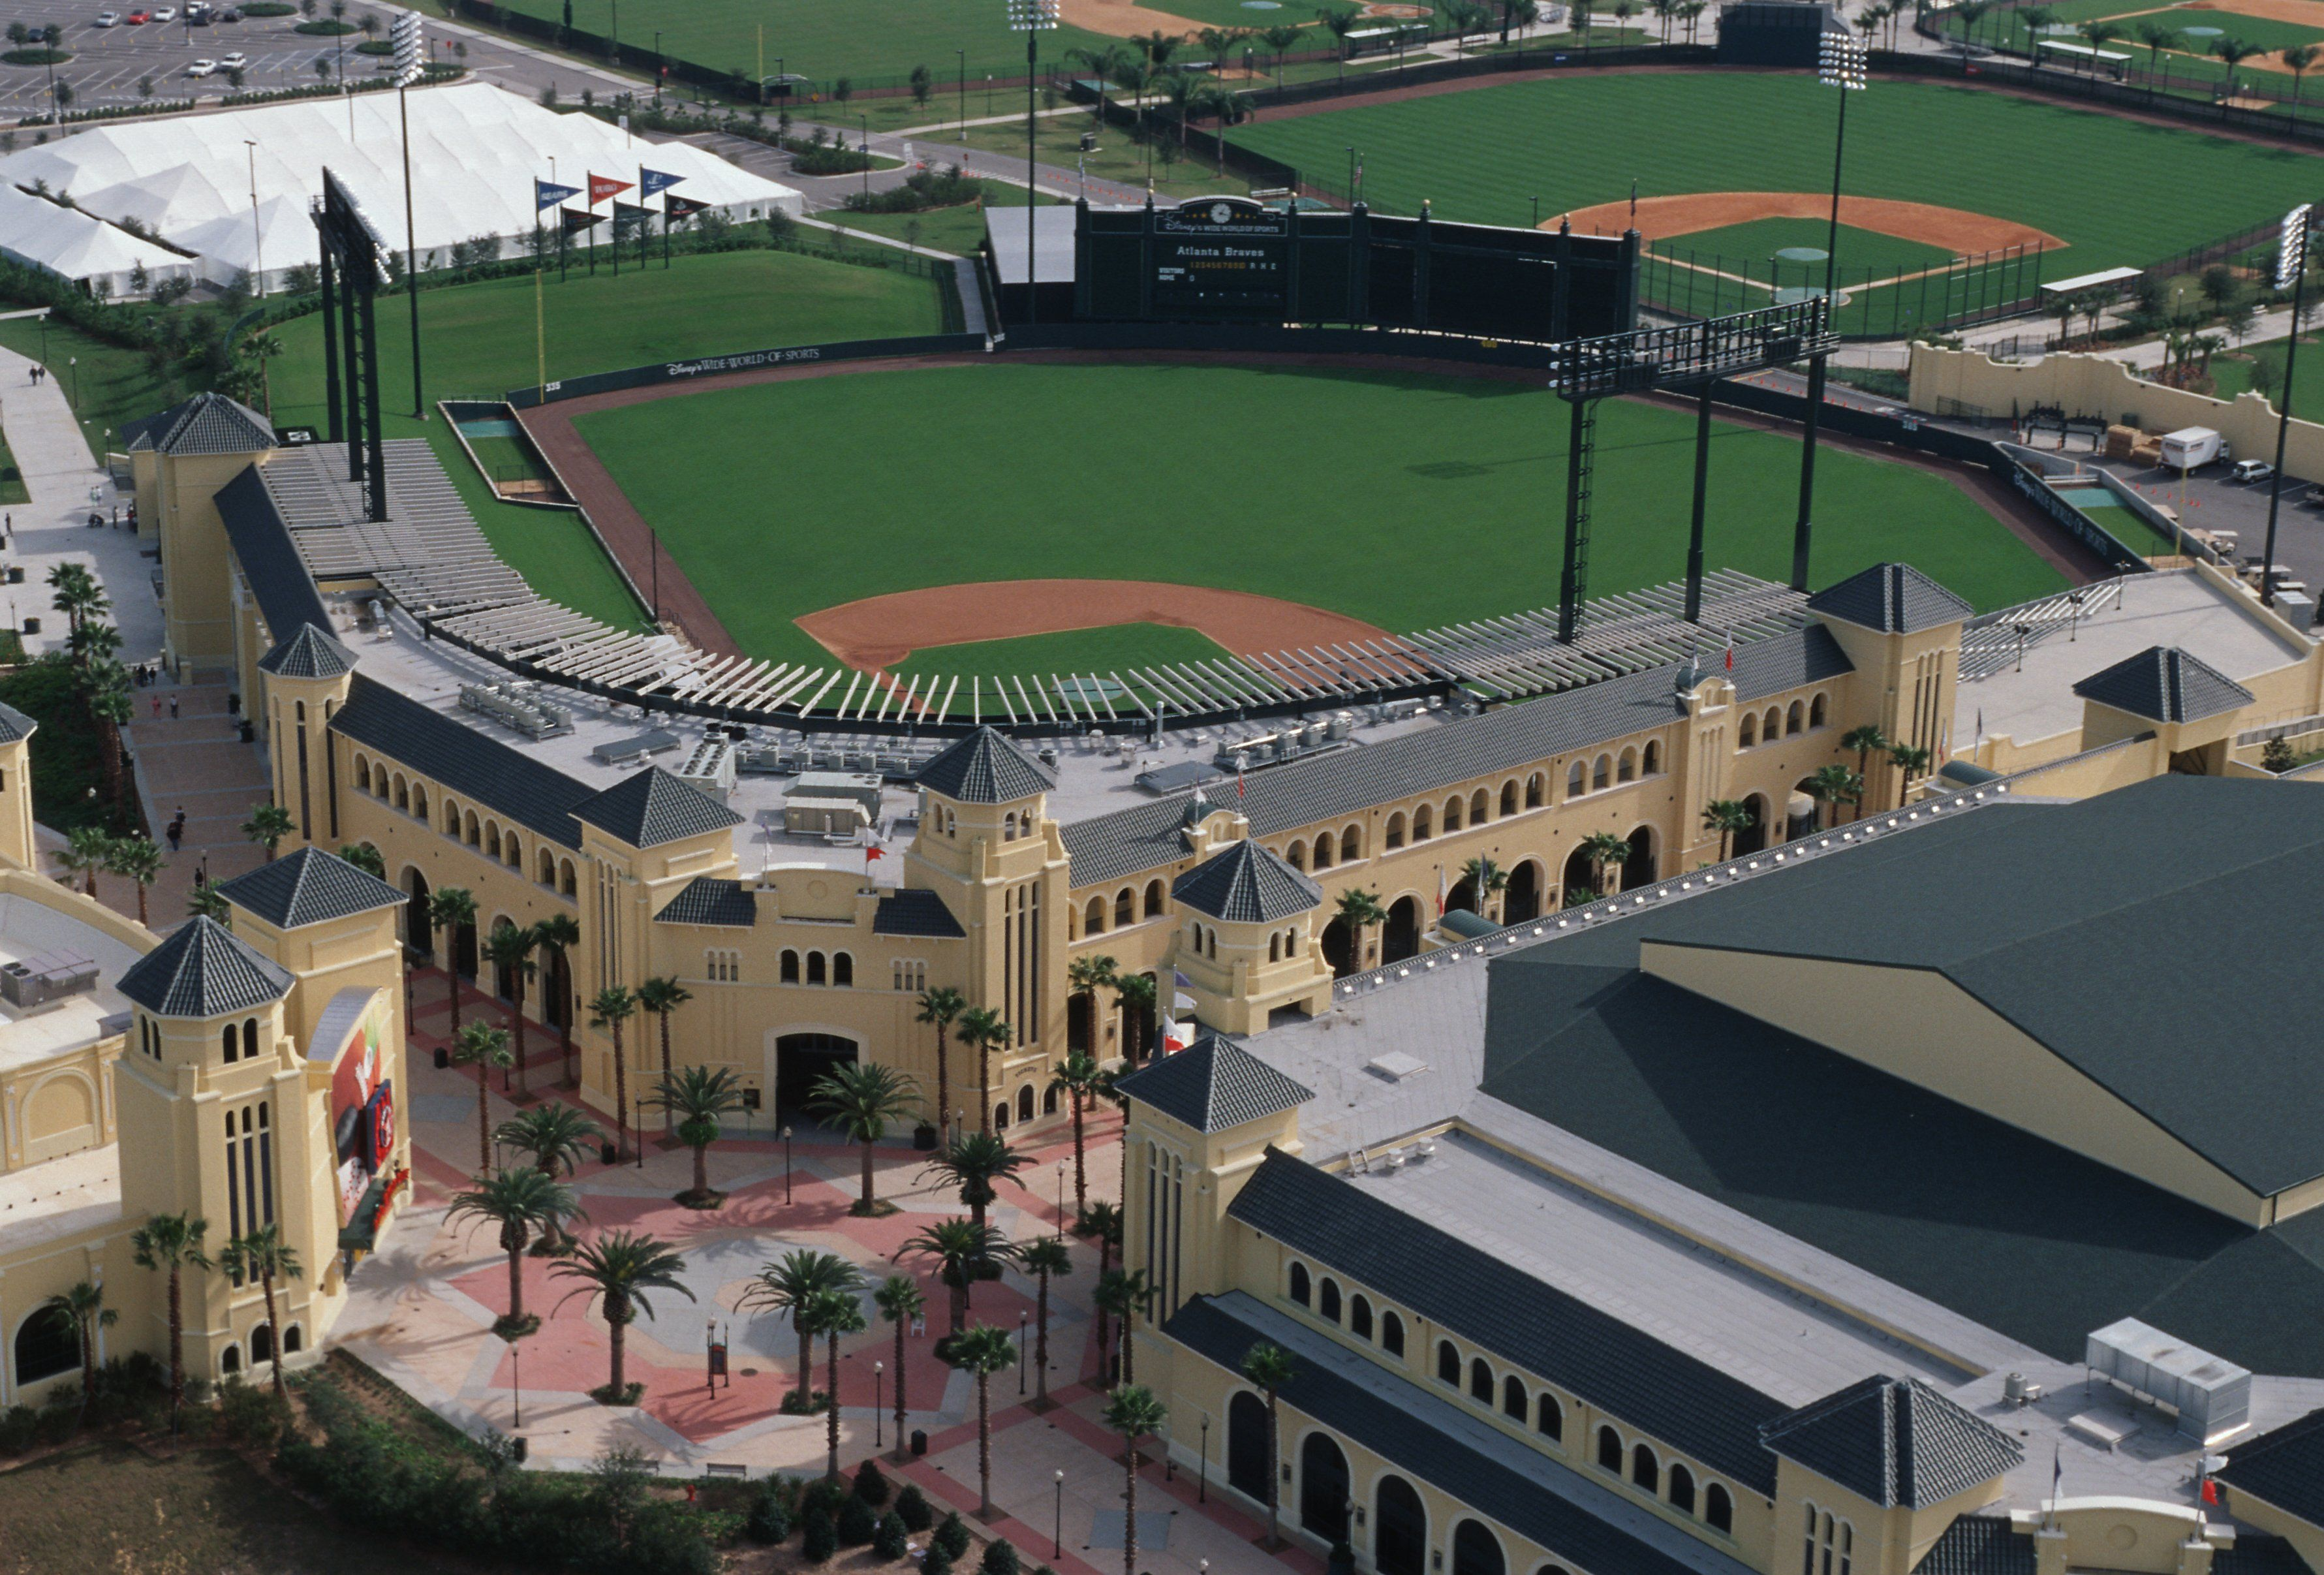 Atlanta Braves Spring Training Espn Wide World Of Sports Orlando